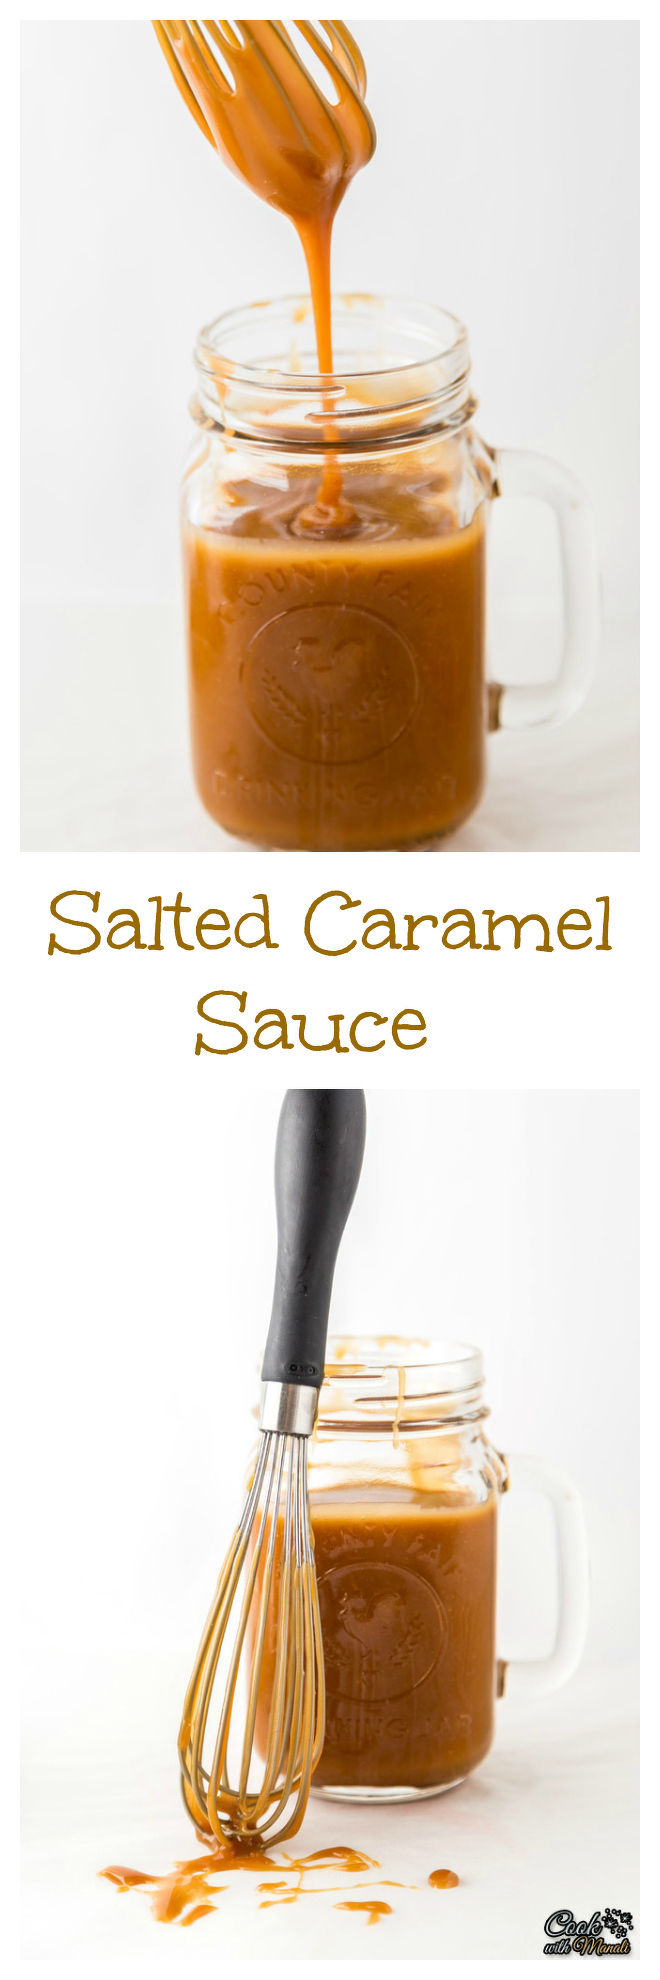 Salted Caramel Sauce Collage-nocwm